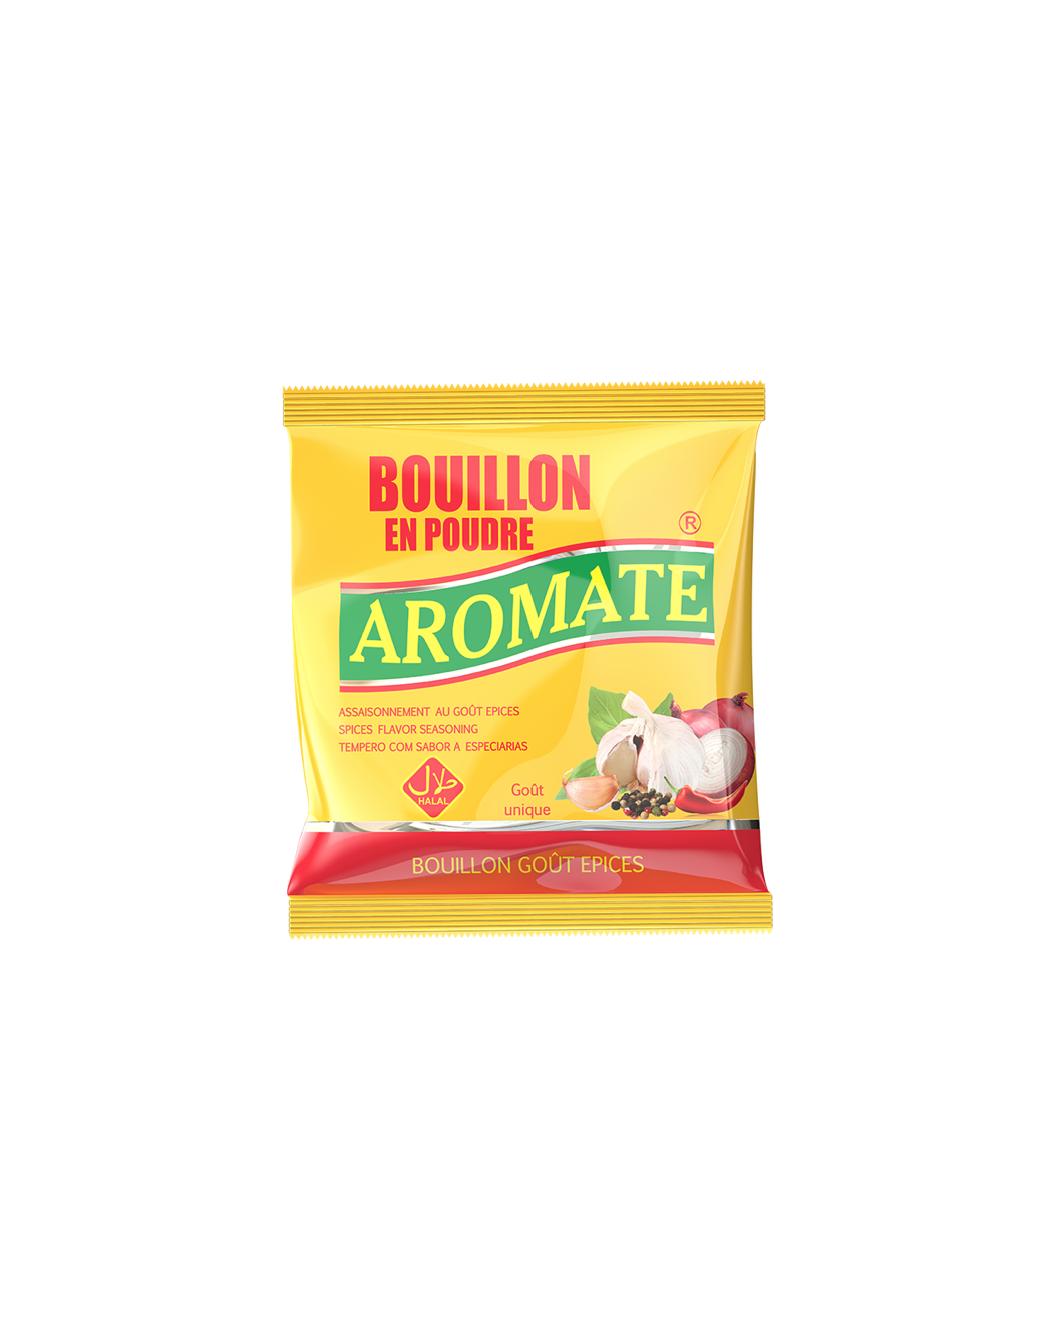 Bouillon AROMATE_Epices Sachet 75g_Siprochim